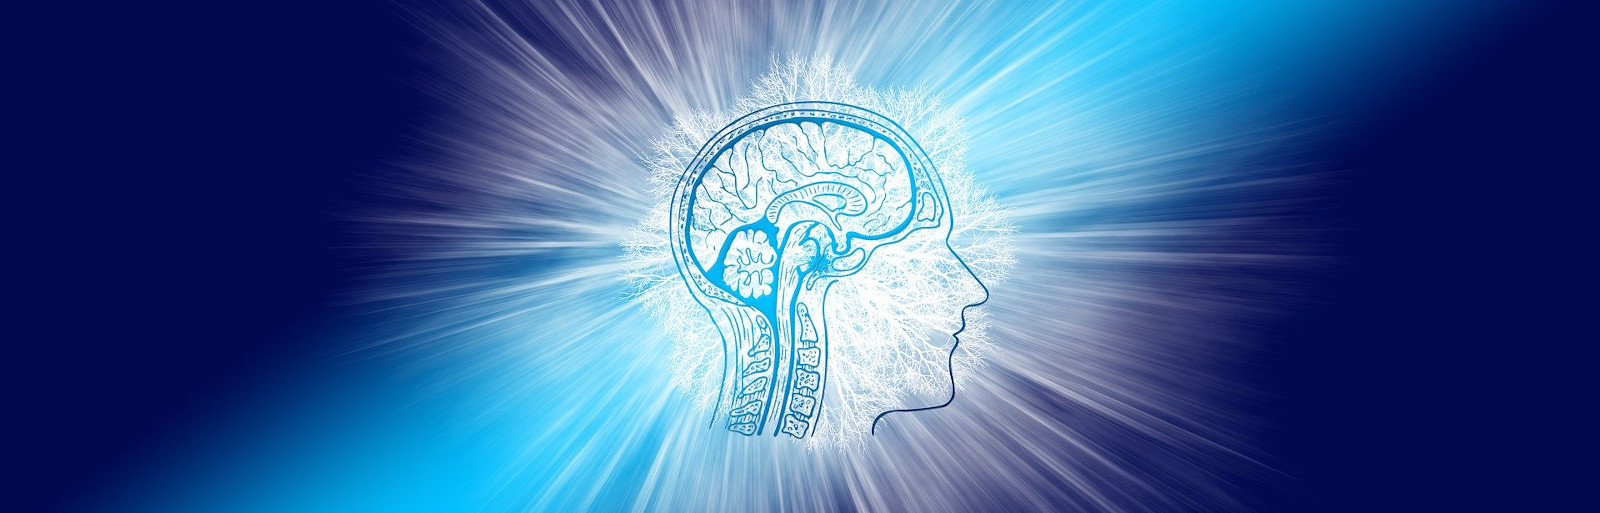 neuroATLANTIC - An Atlantic innovation platform on diagnosis and treatment of neurological diseases and aging - 2